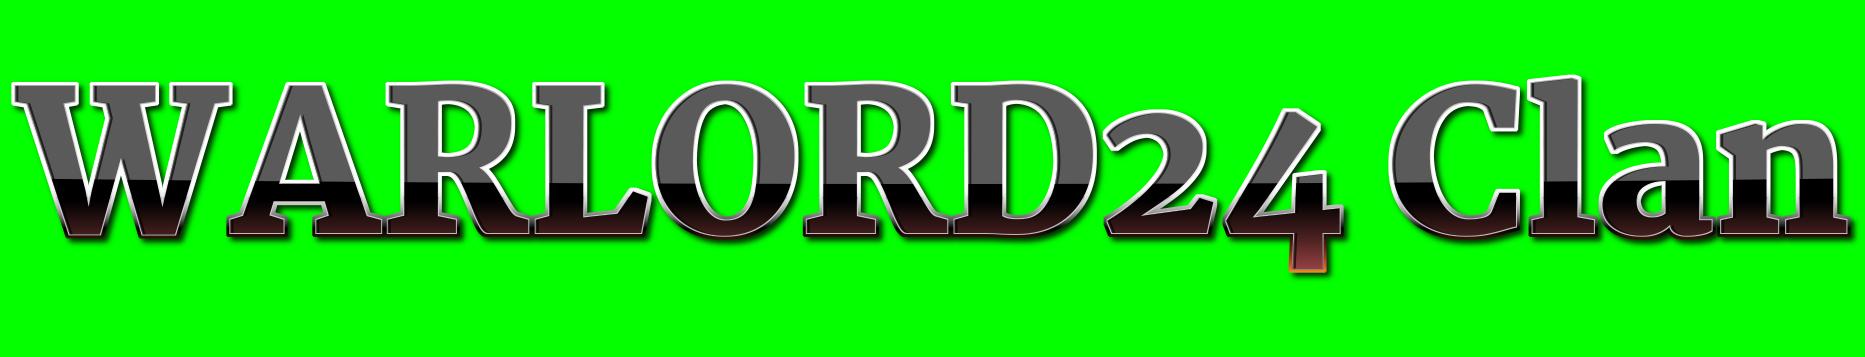 Warlord clan logo free maker